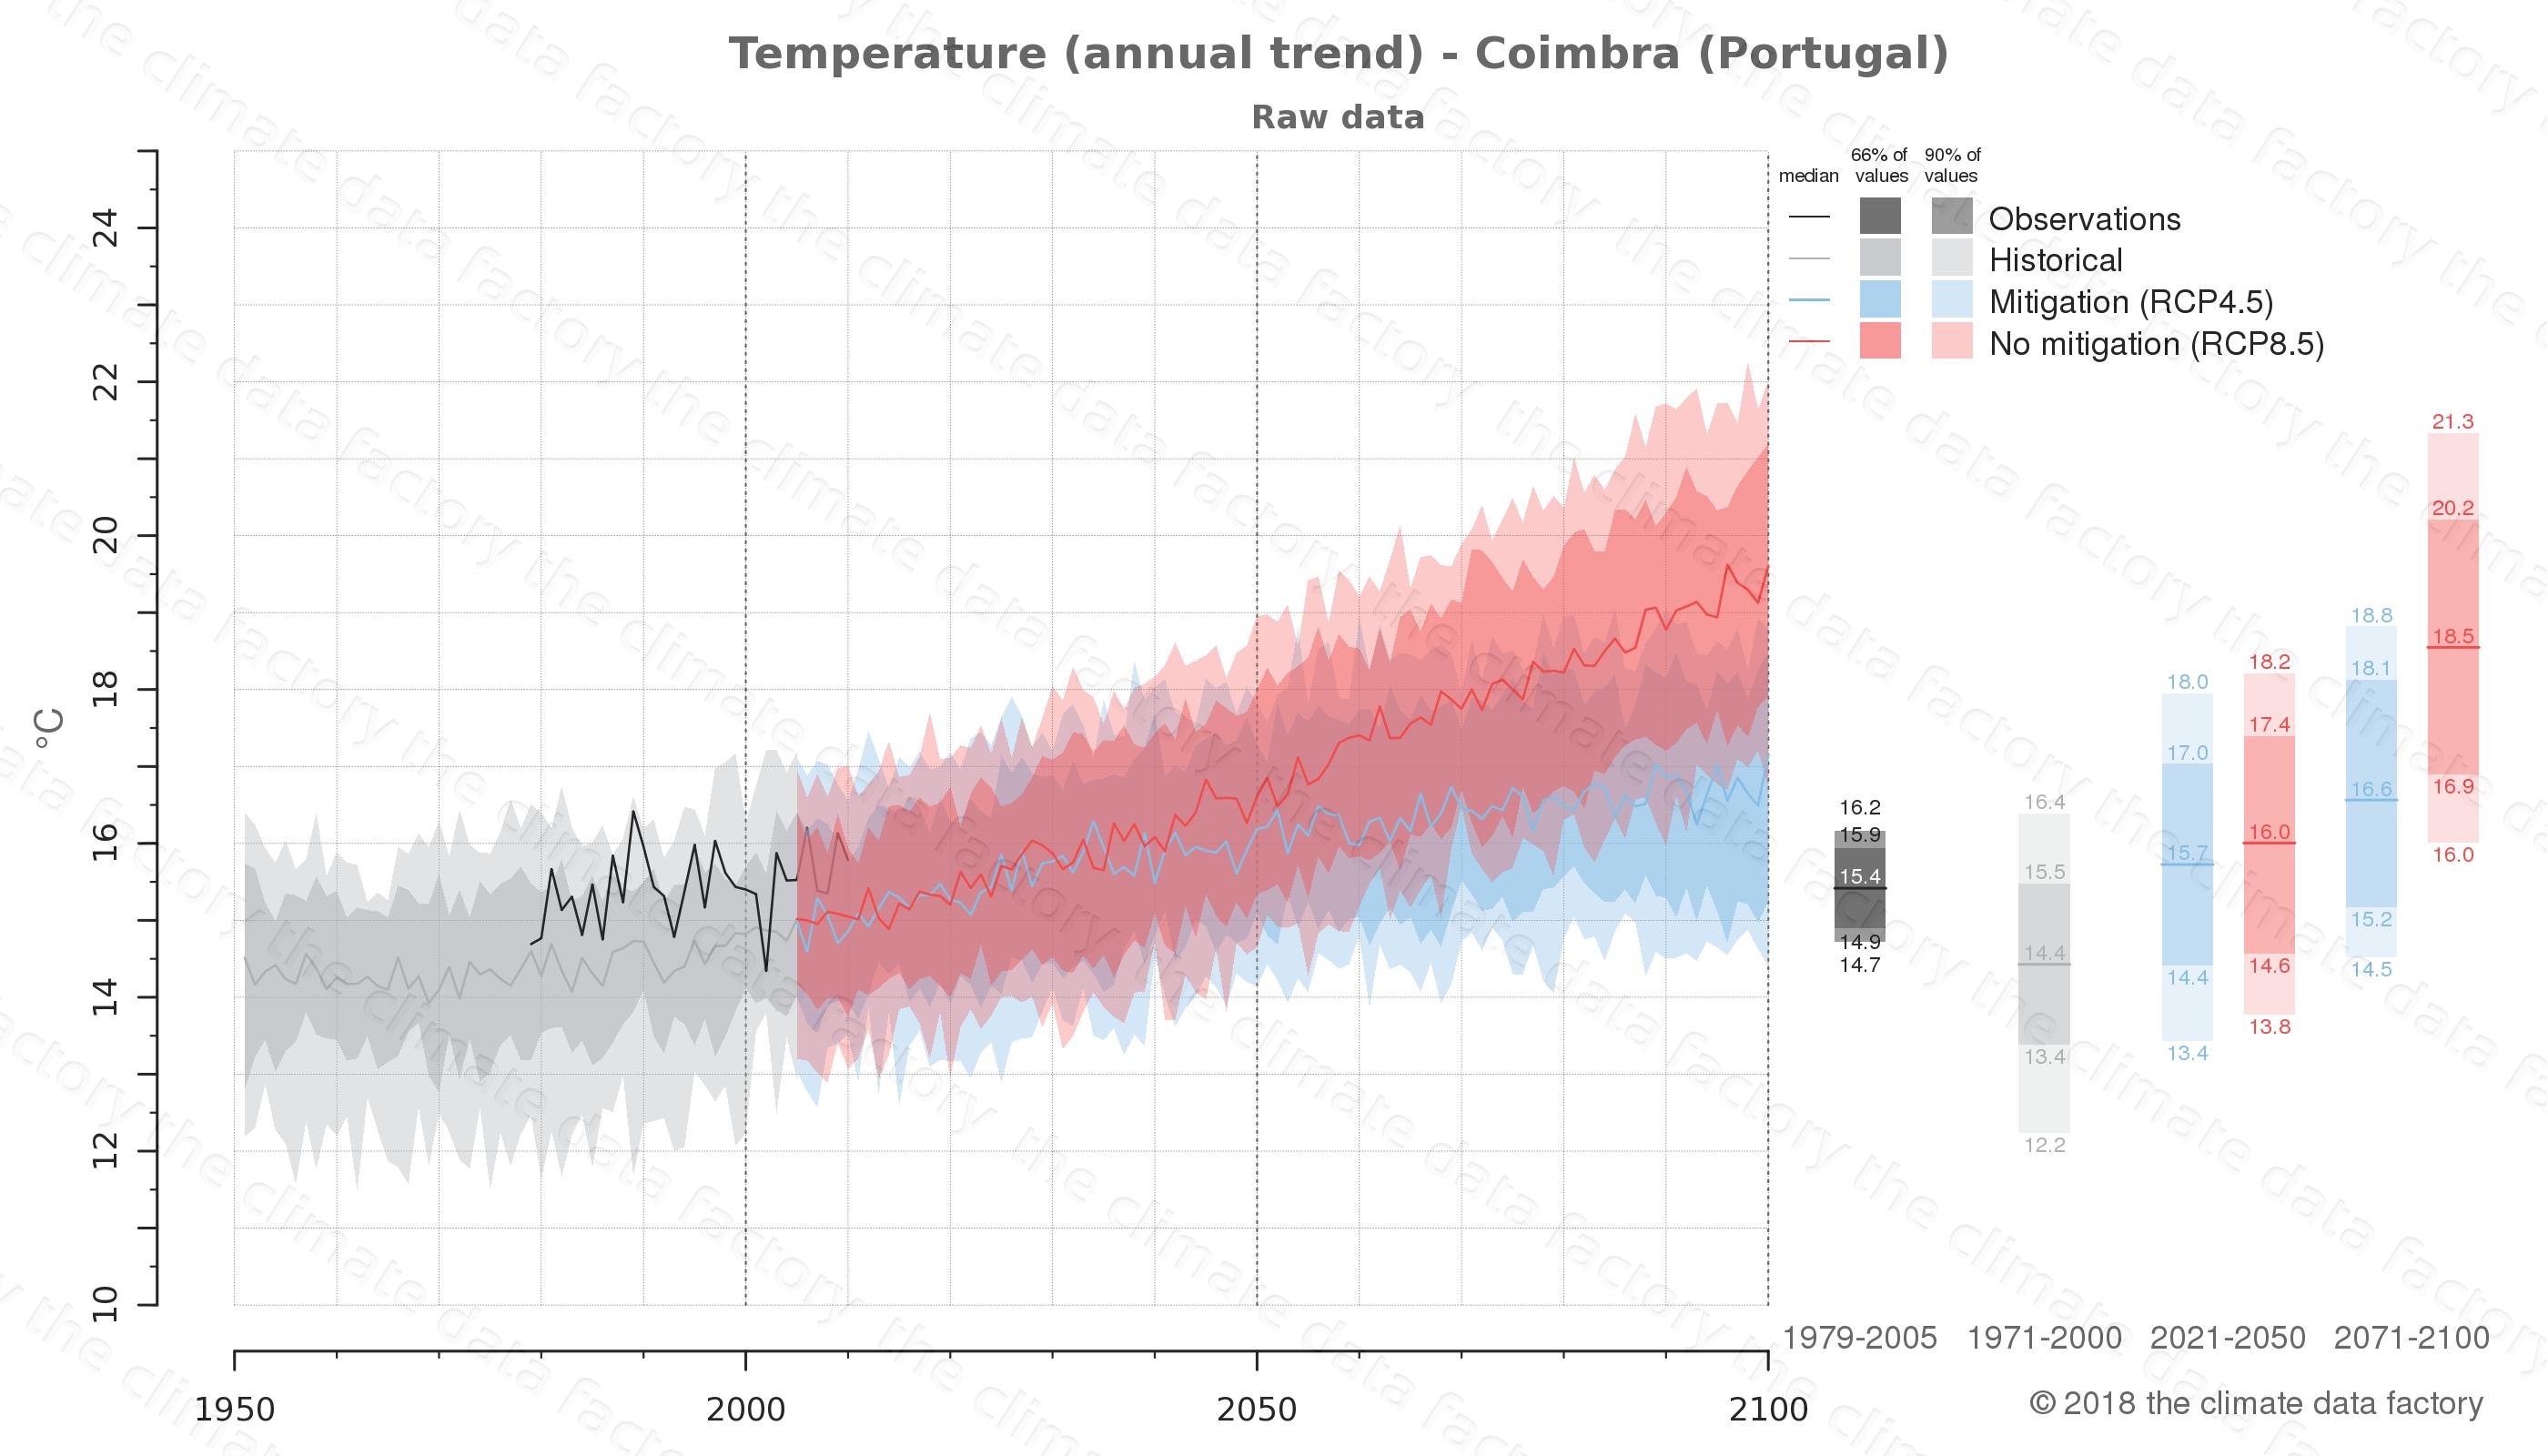 climate change data policy adaptation climate graph city data temperature coimbra portugal